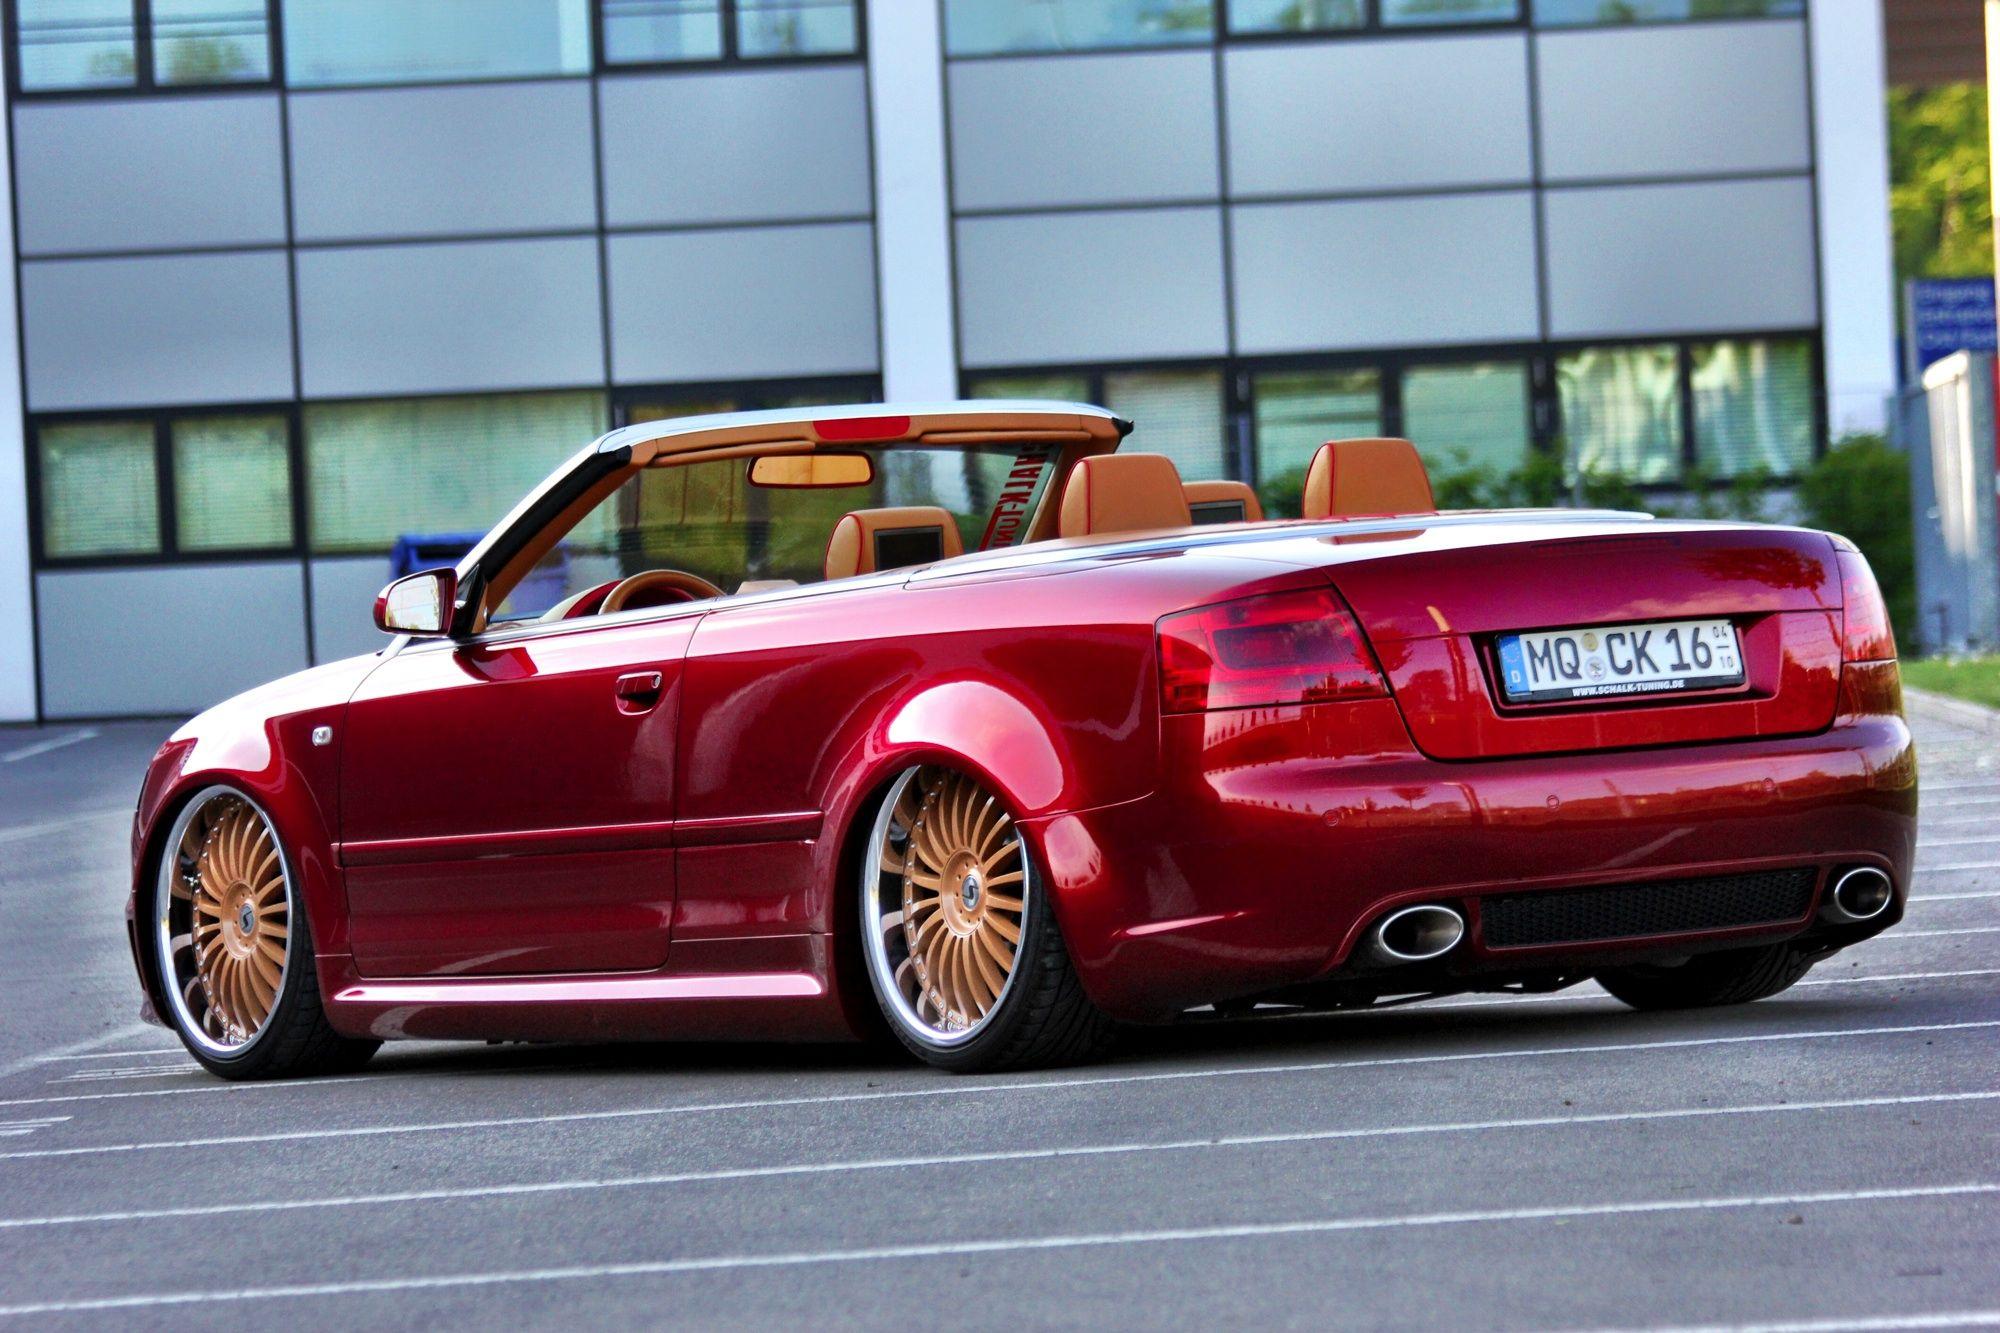 Audi A4 Cabrio  Das Freiluftgefährt In Candy Rot